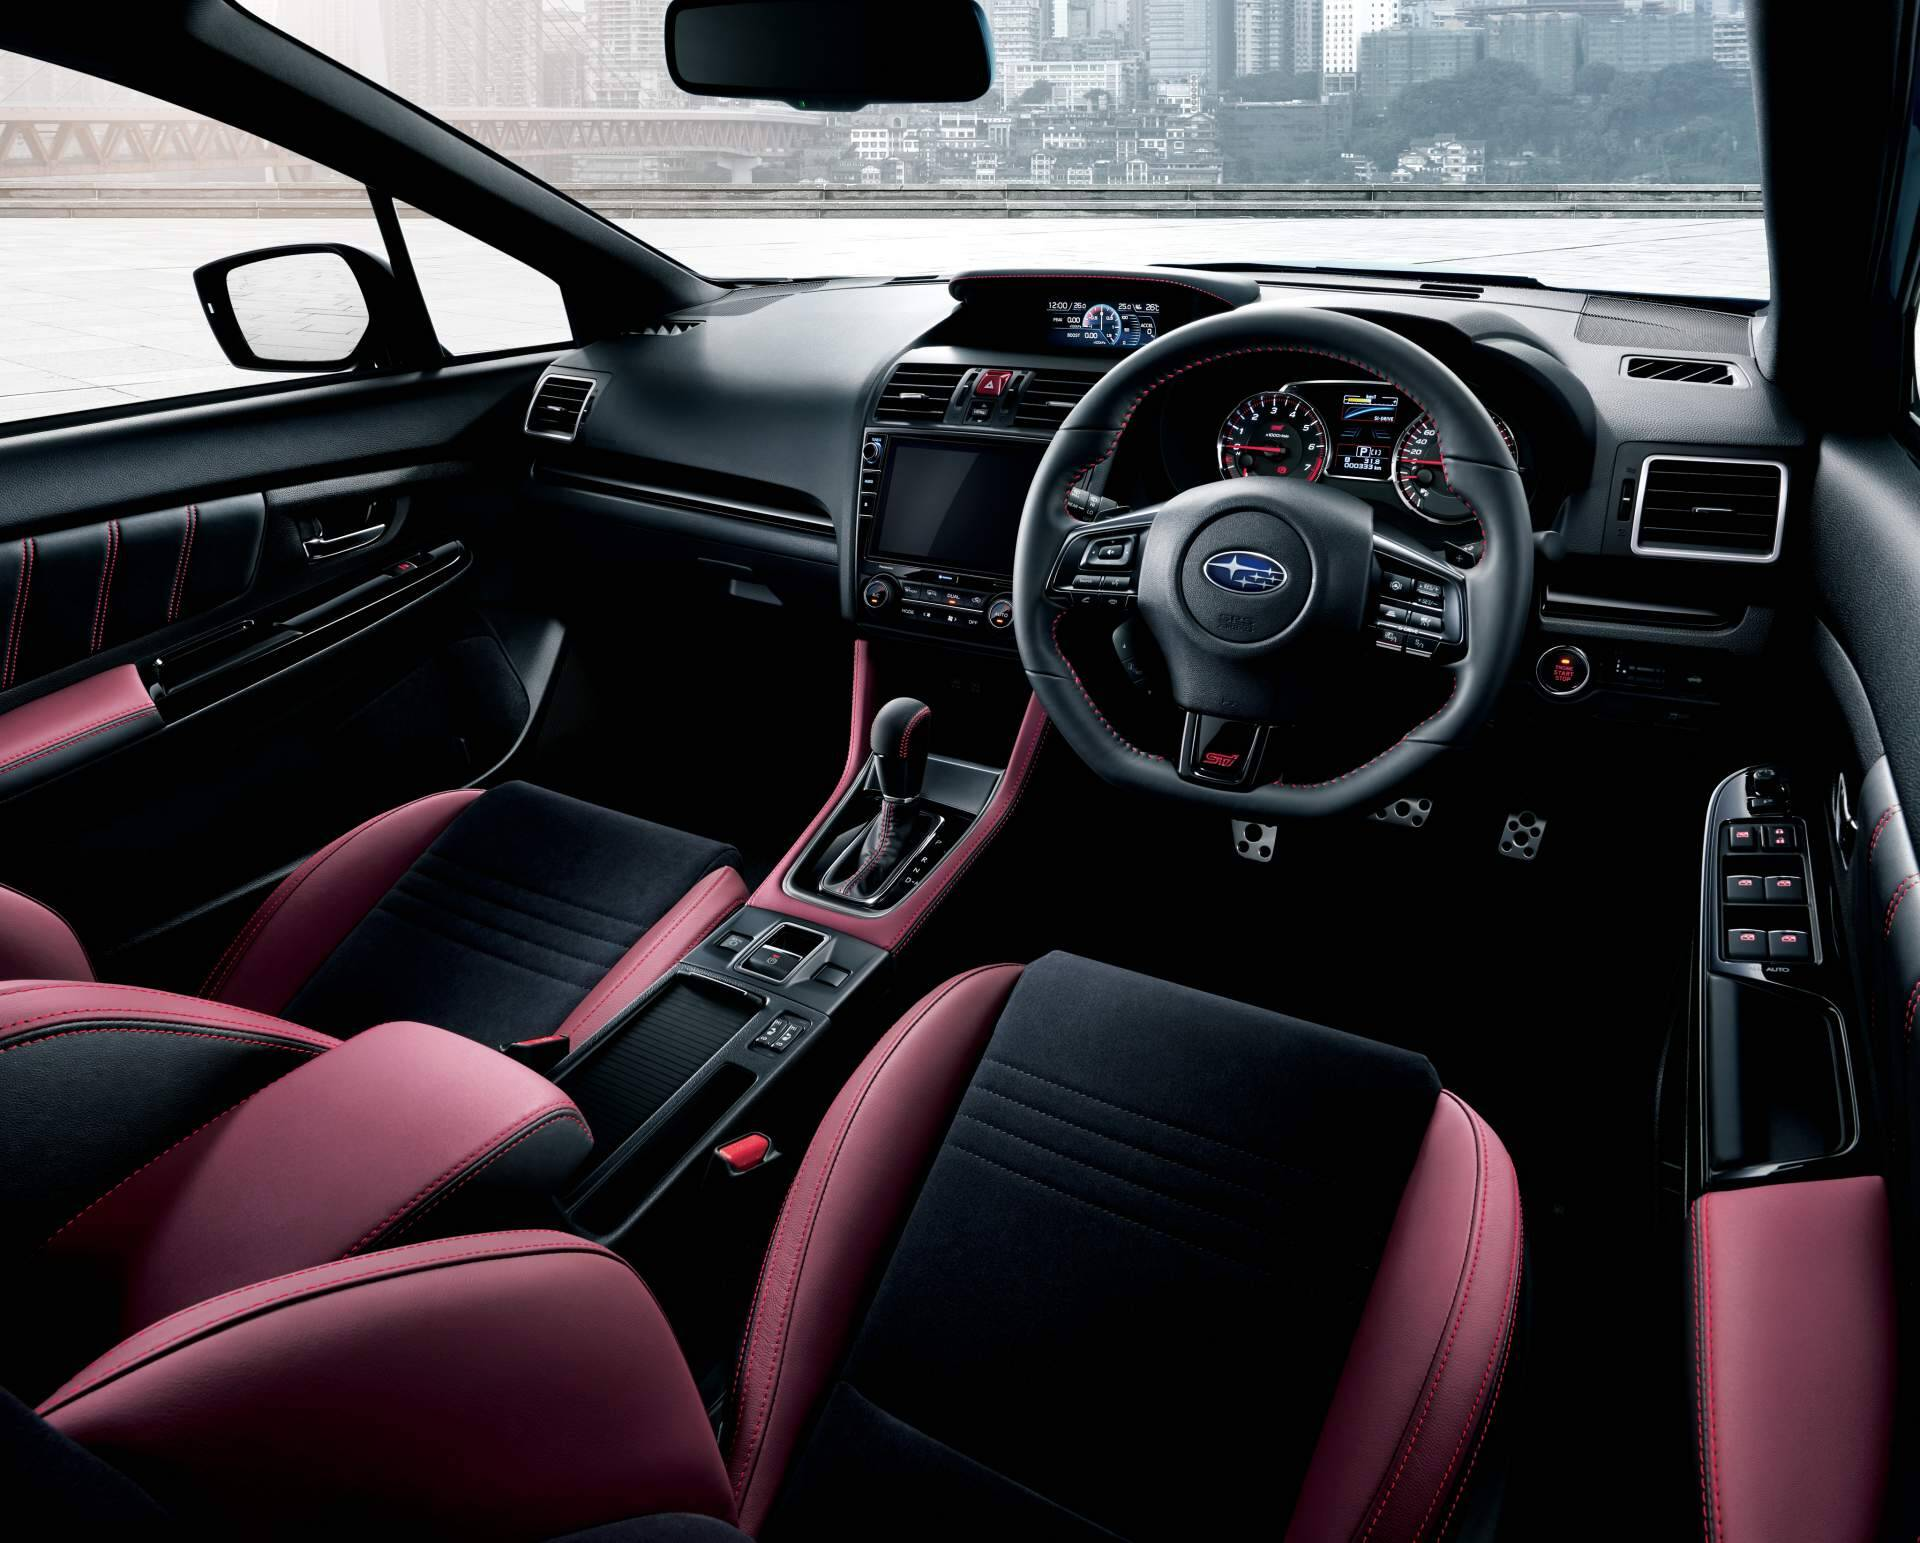 Subaru Impreza WRX STI S4. Foto: Divulgação